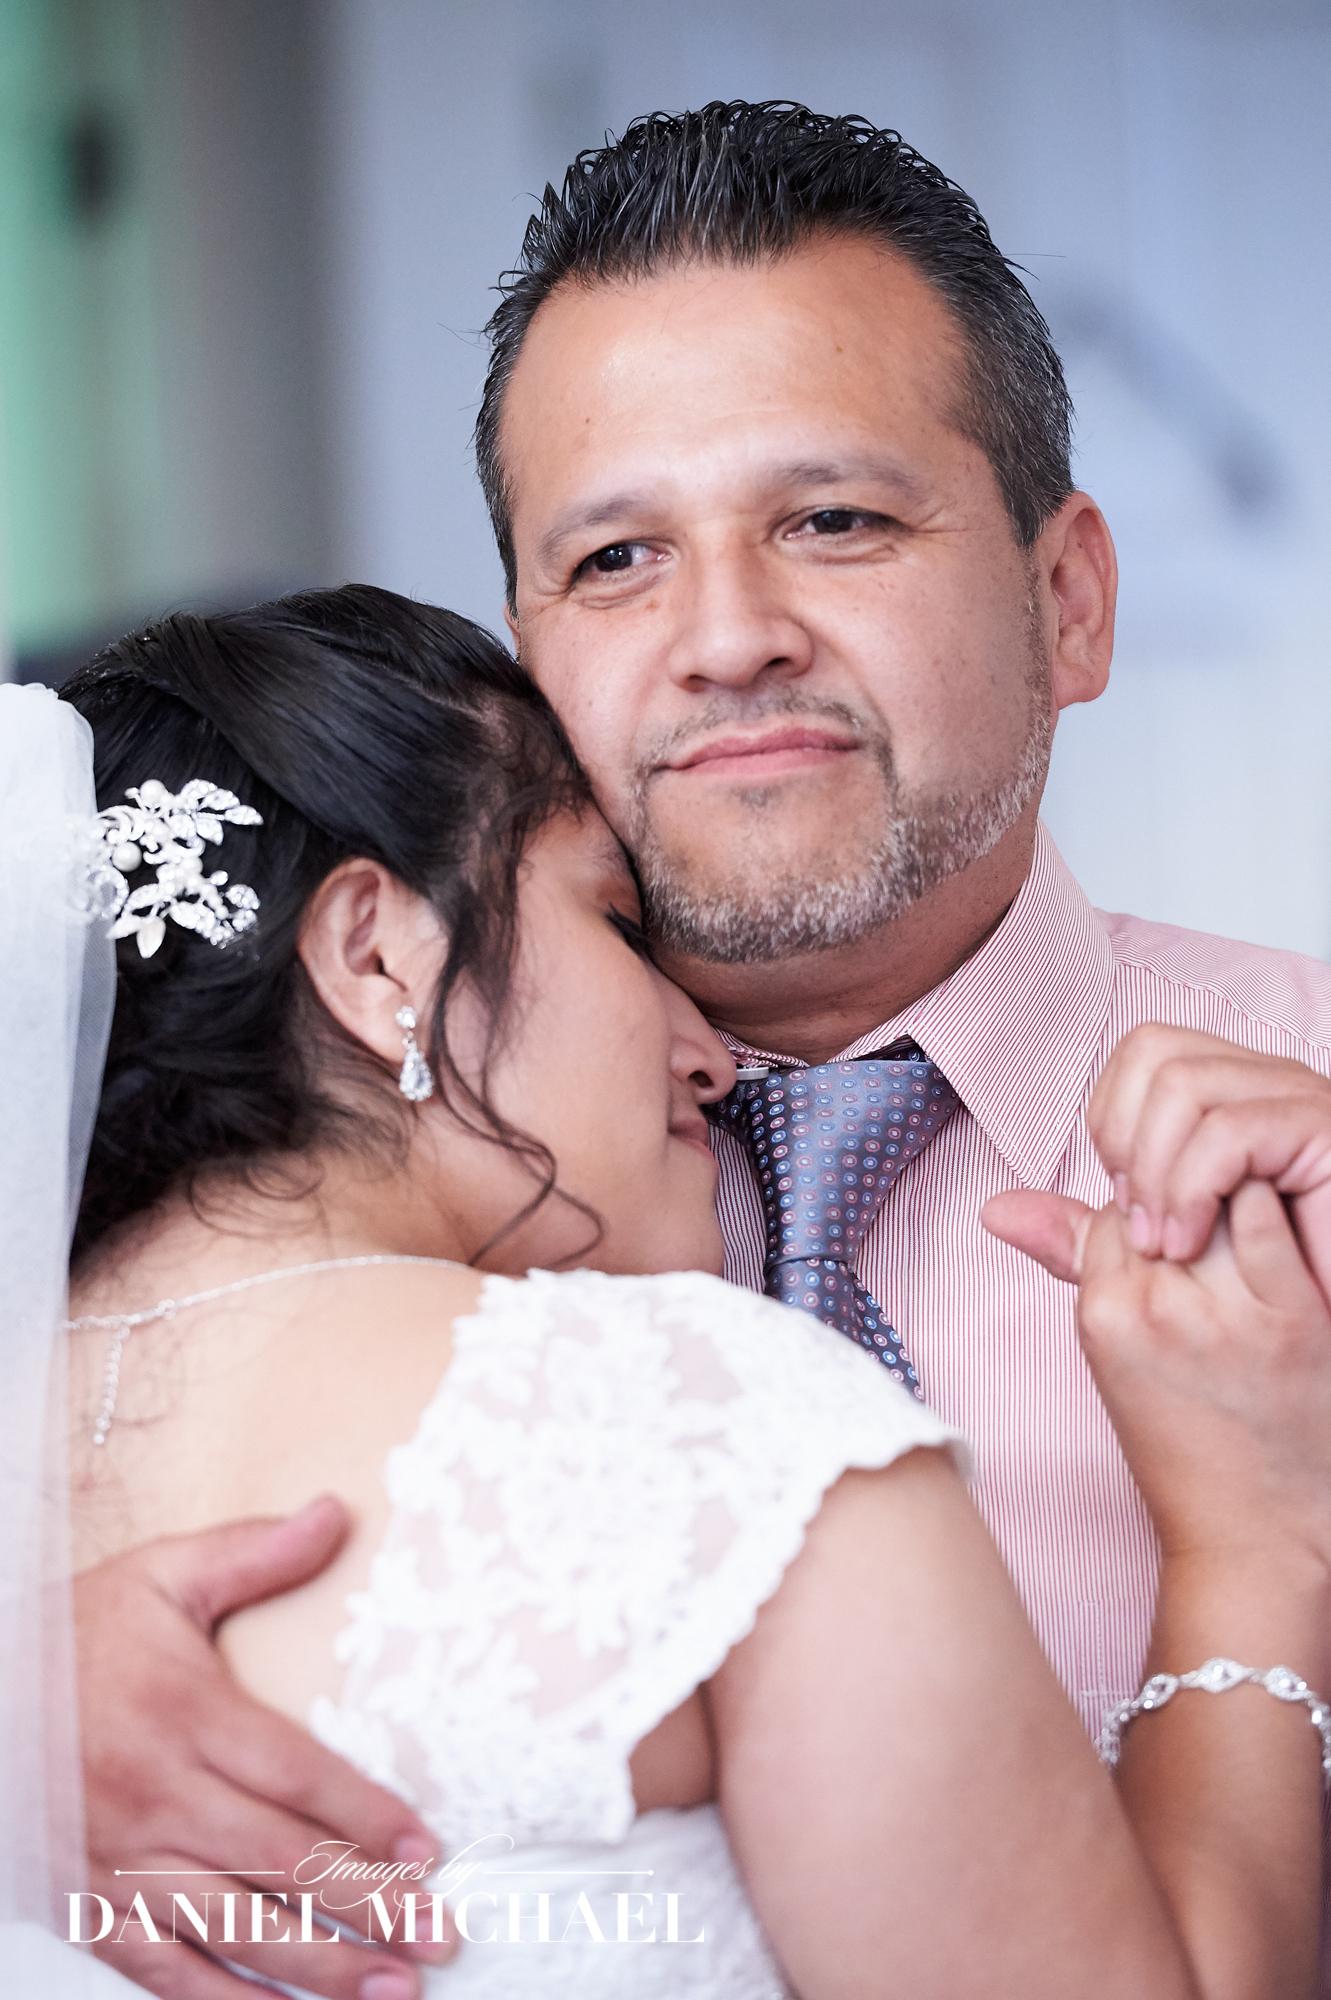 Wedding Photographer in Cincinnati, OH | Images by Daniel Michael